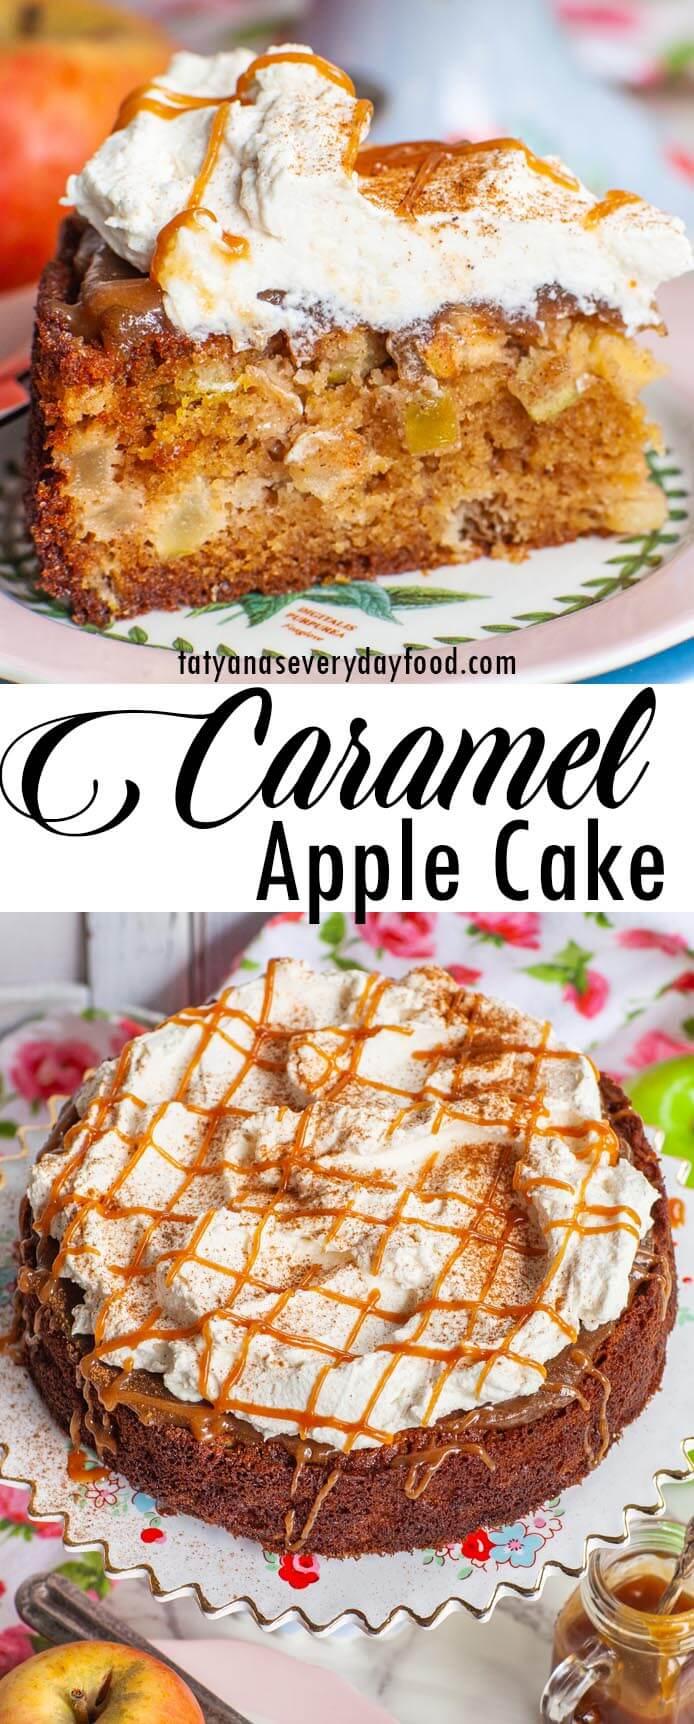 Easy Caramel Apple Cake video recipe